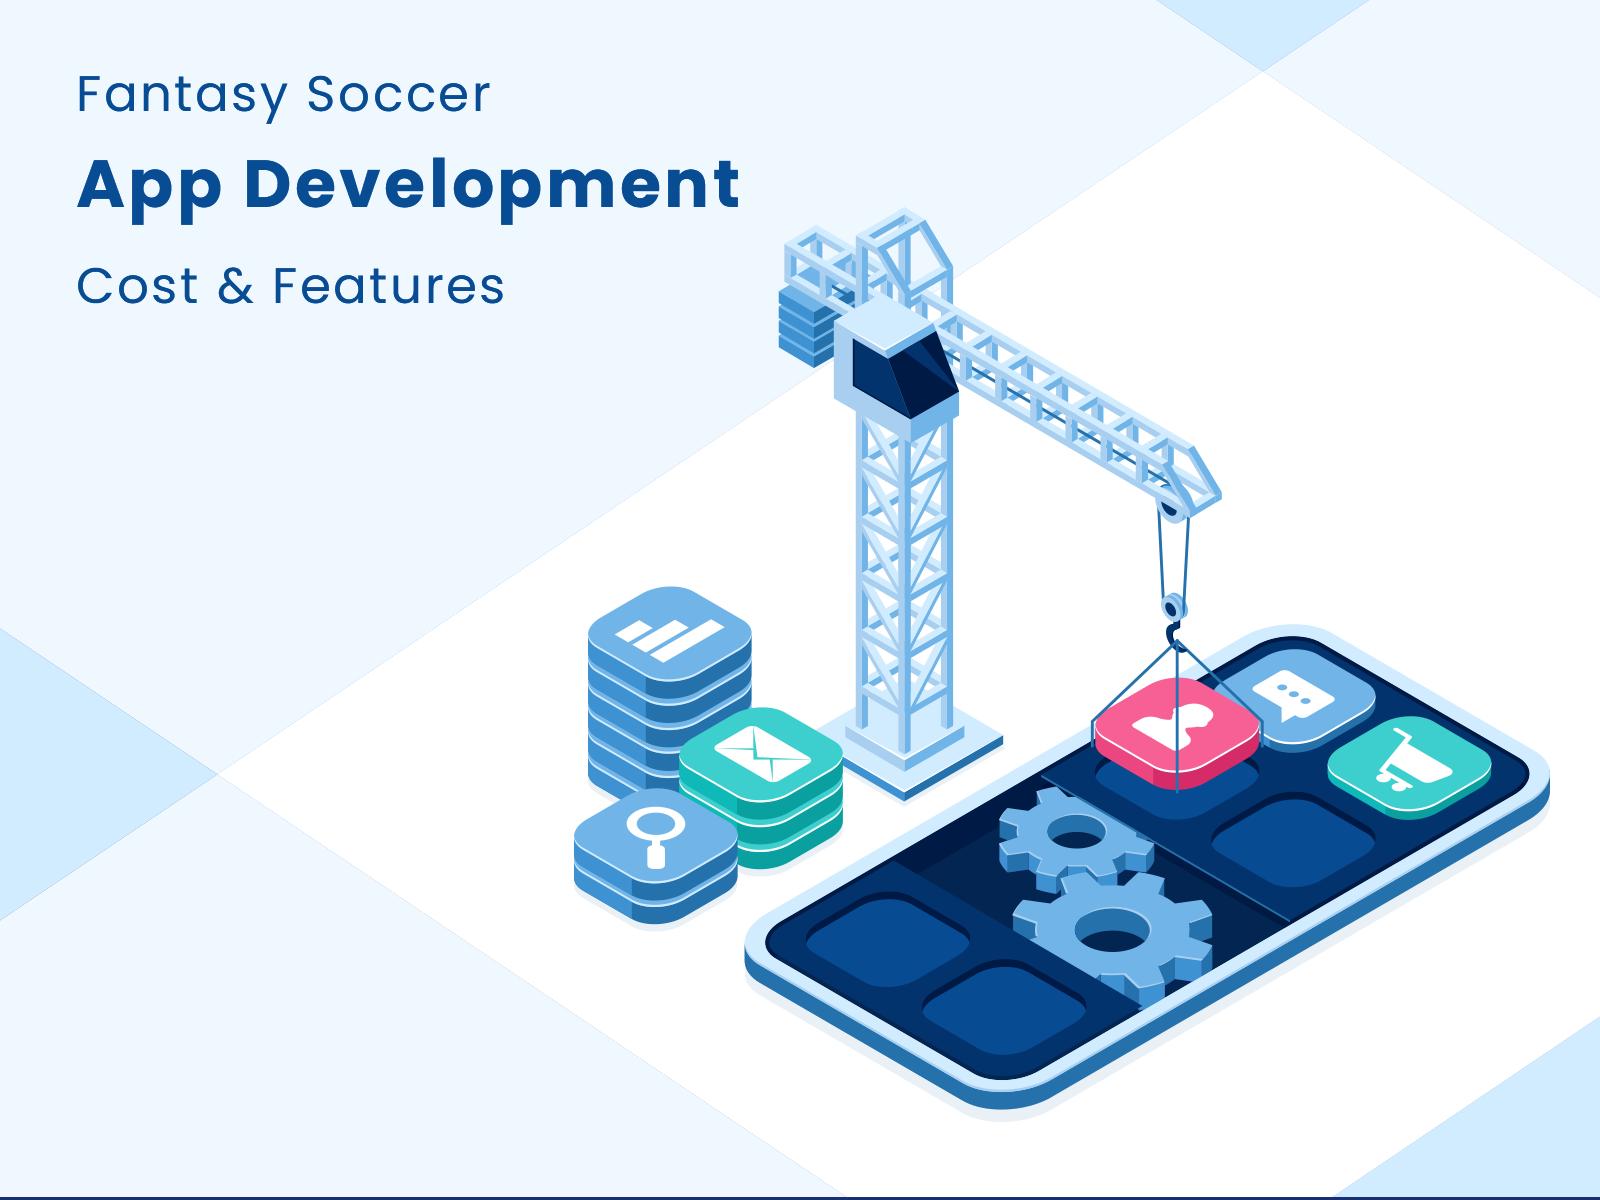 Fantasy Soccer App Development Cost & Features